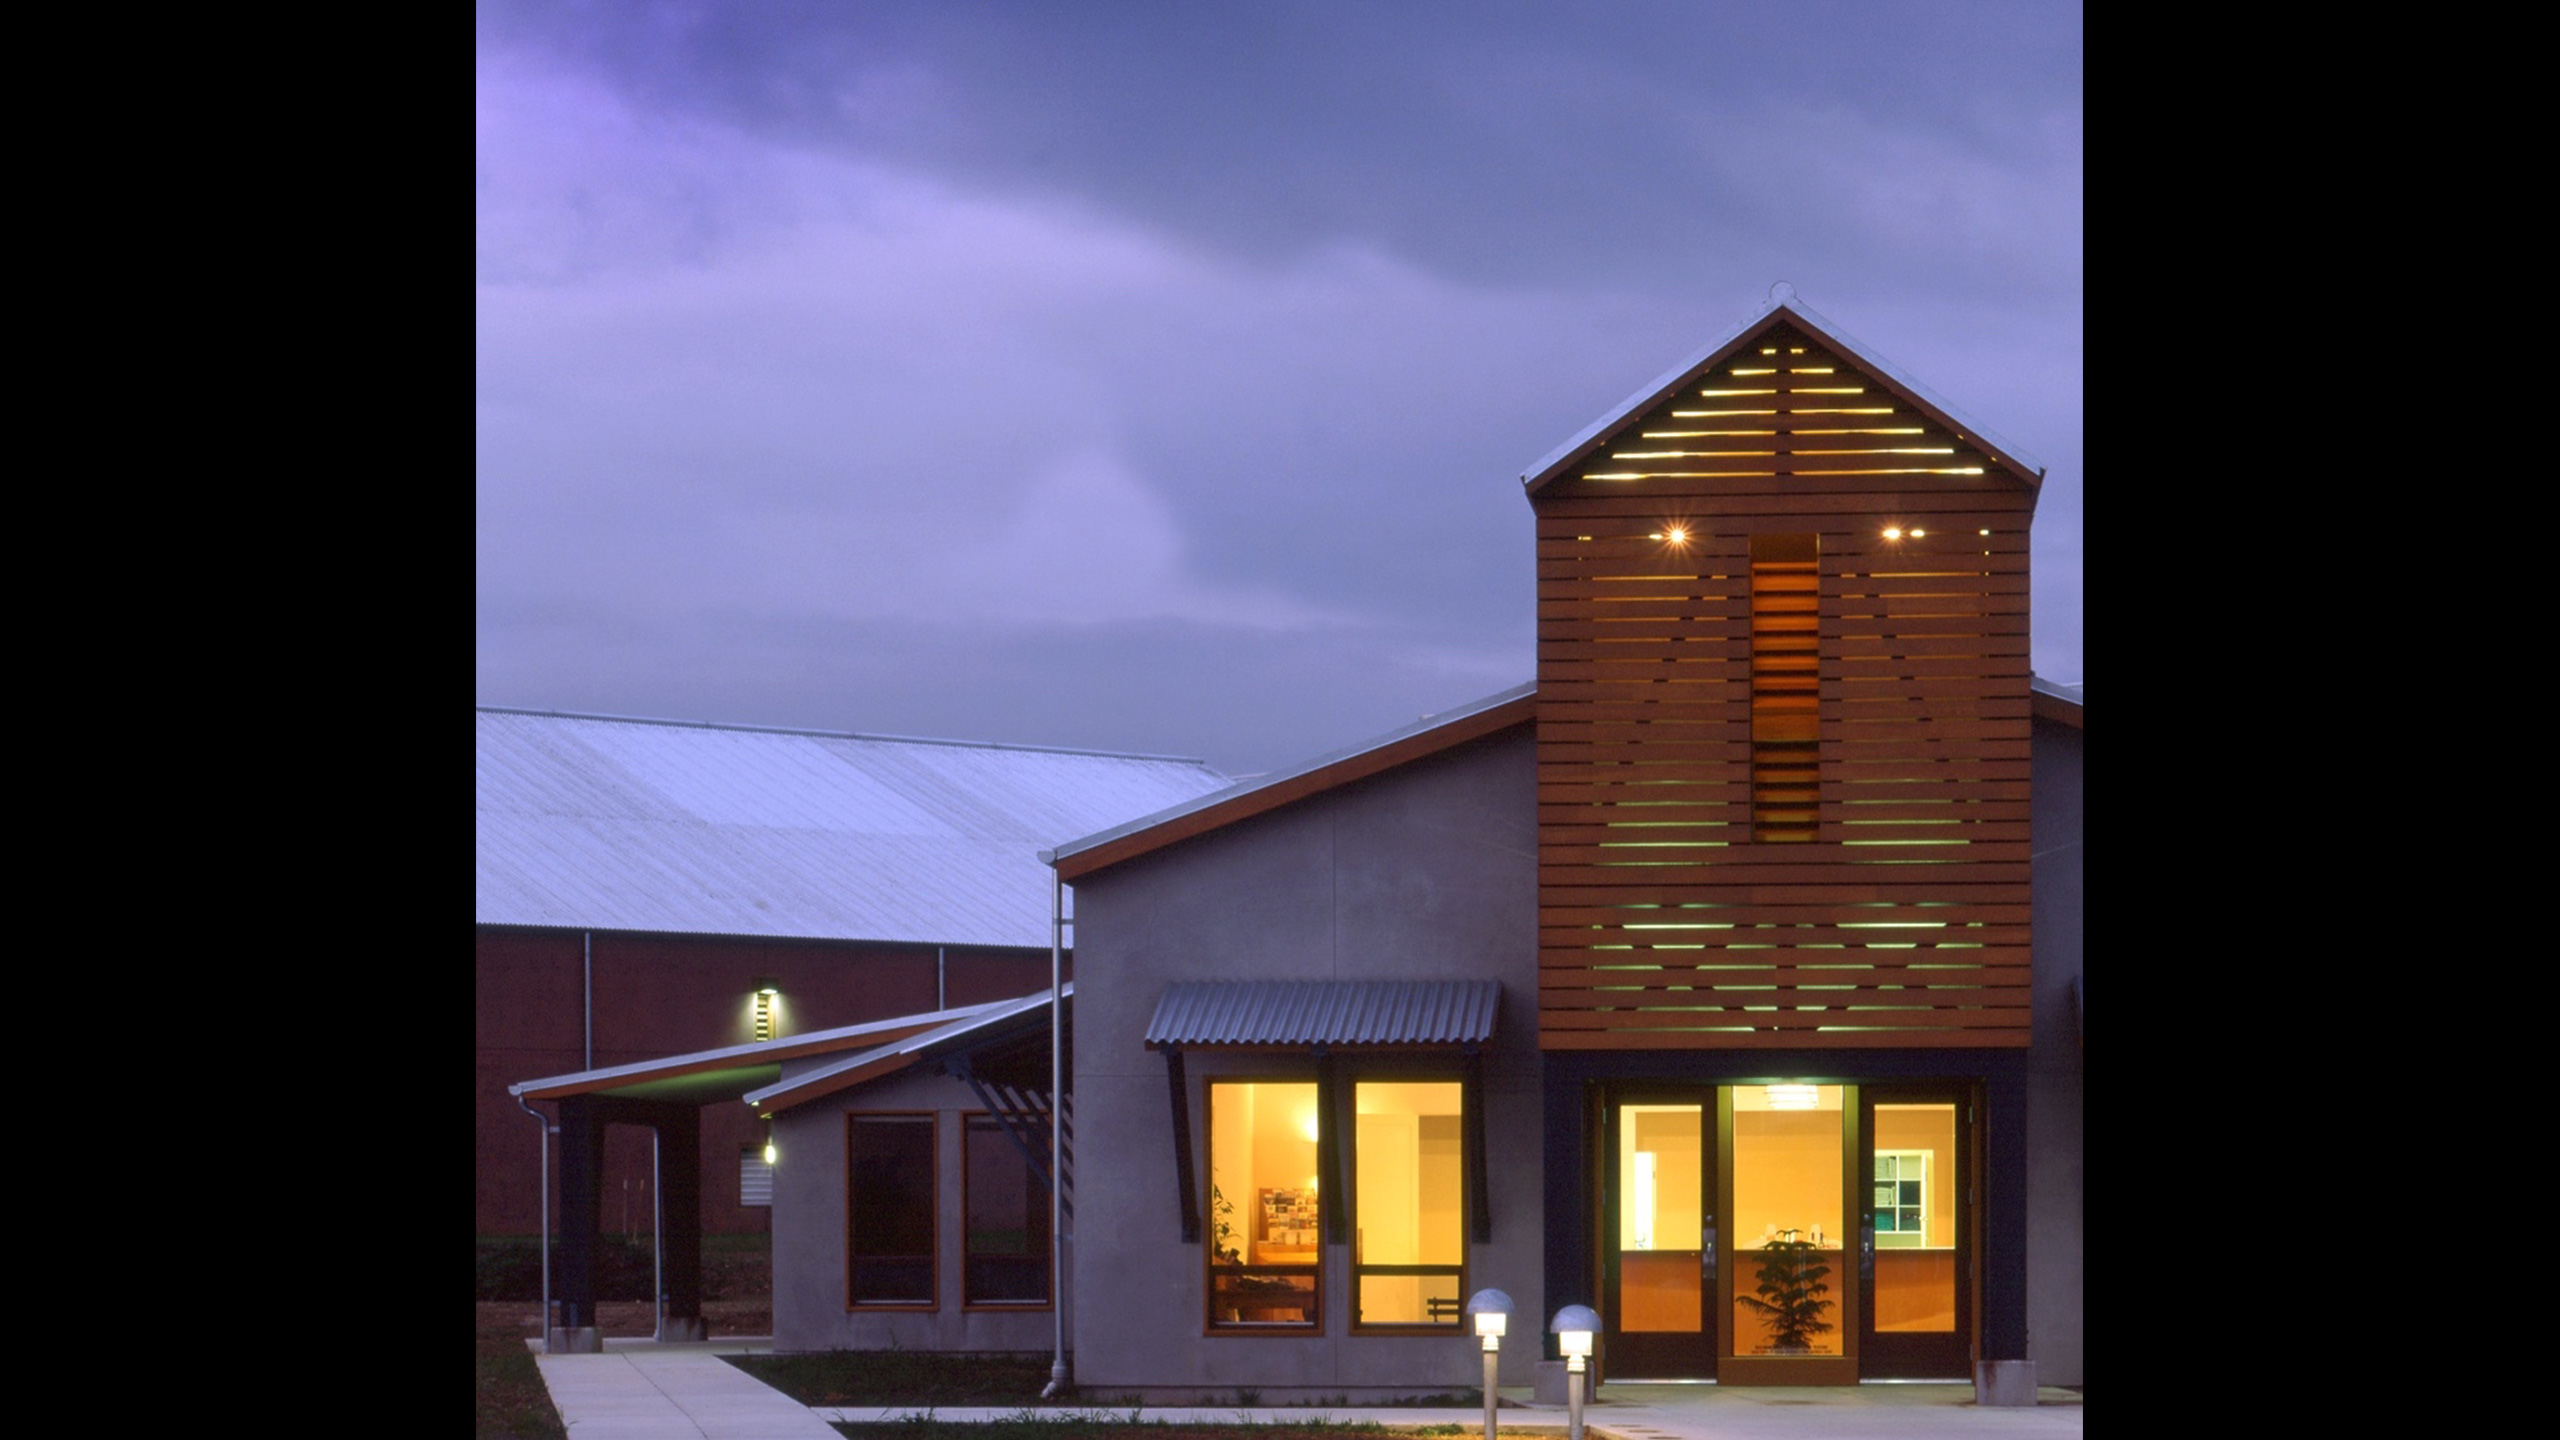 Winery-Architecture-Geyserville-Clos-du-Bois-exterior-2